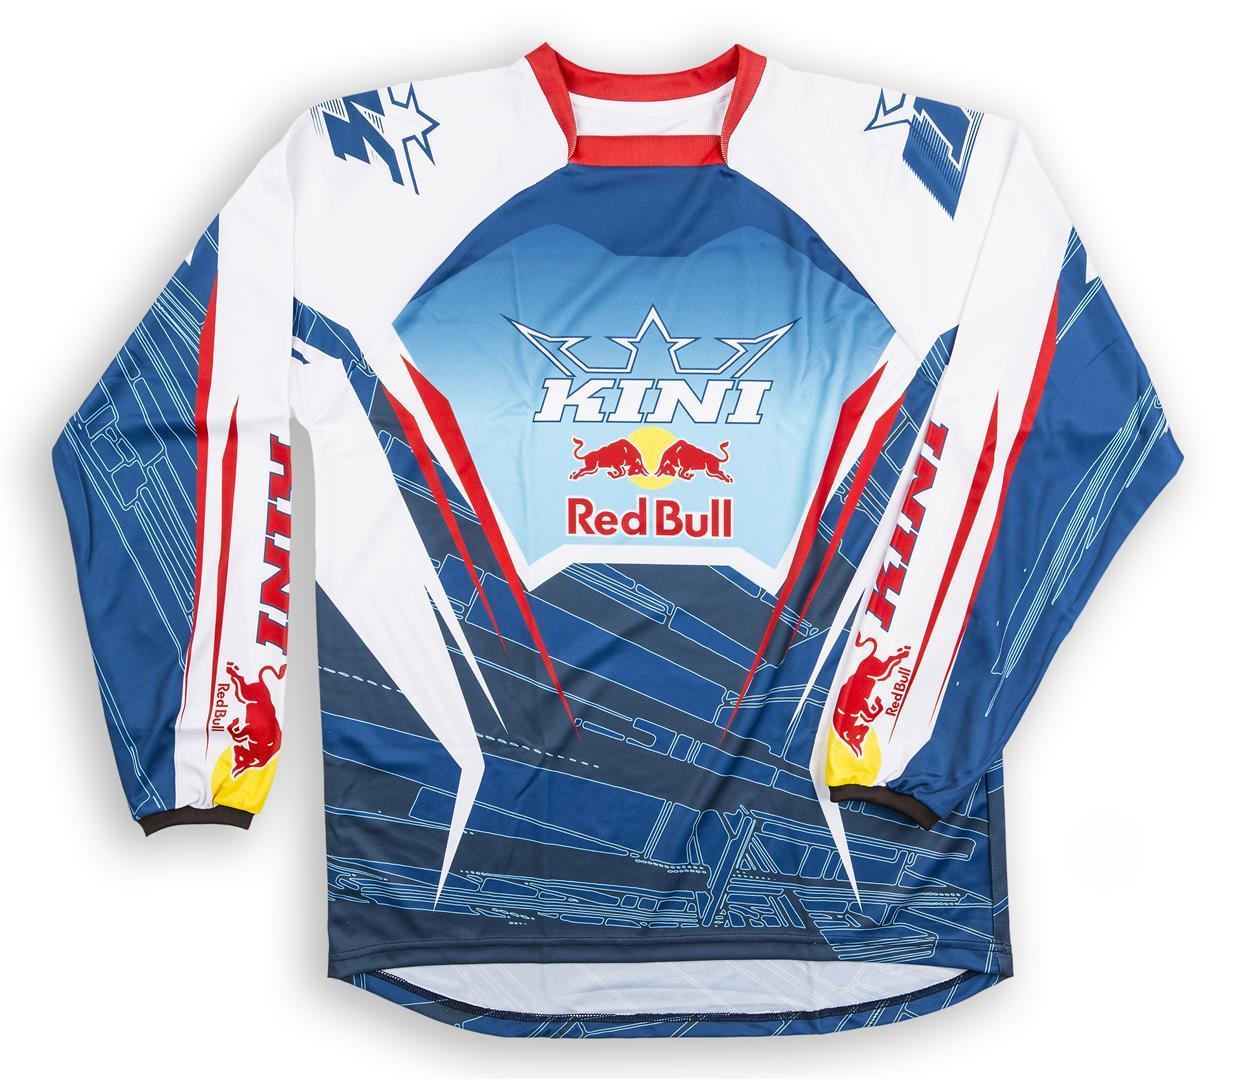 motocross jerseys von kini red bull kini online shop. Black Bedroom Furniture Sets. Home Design Ideas